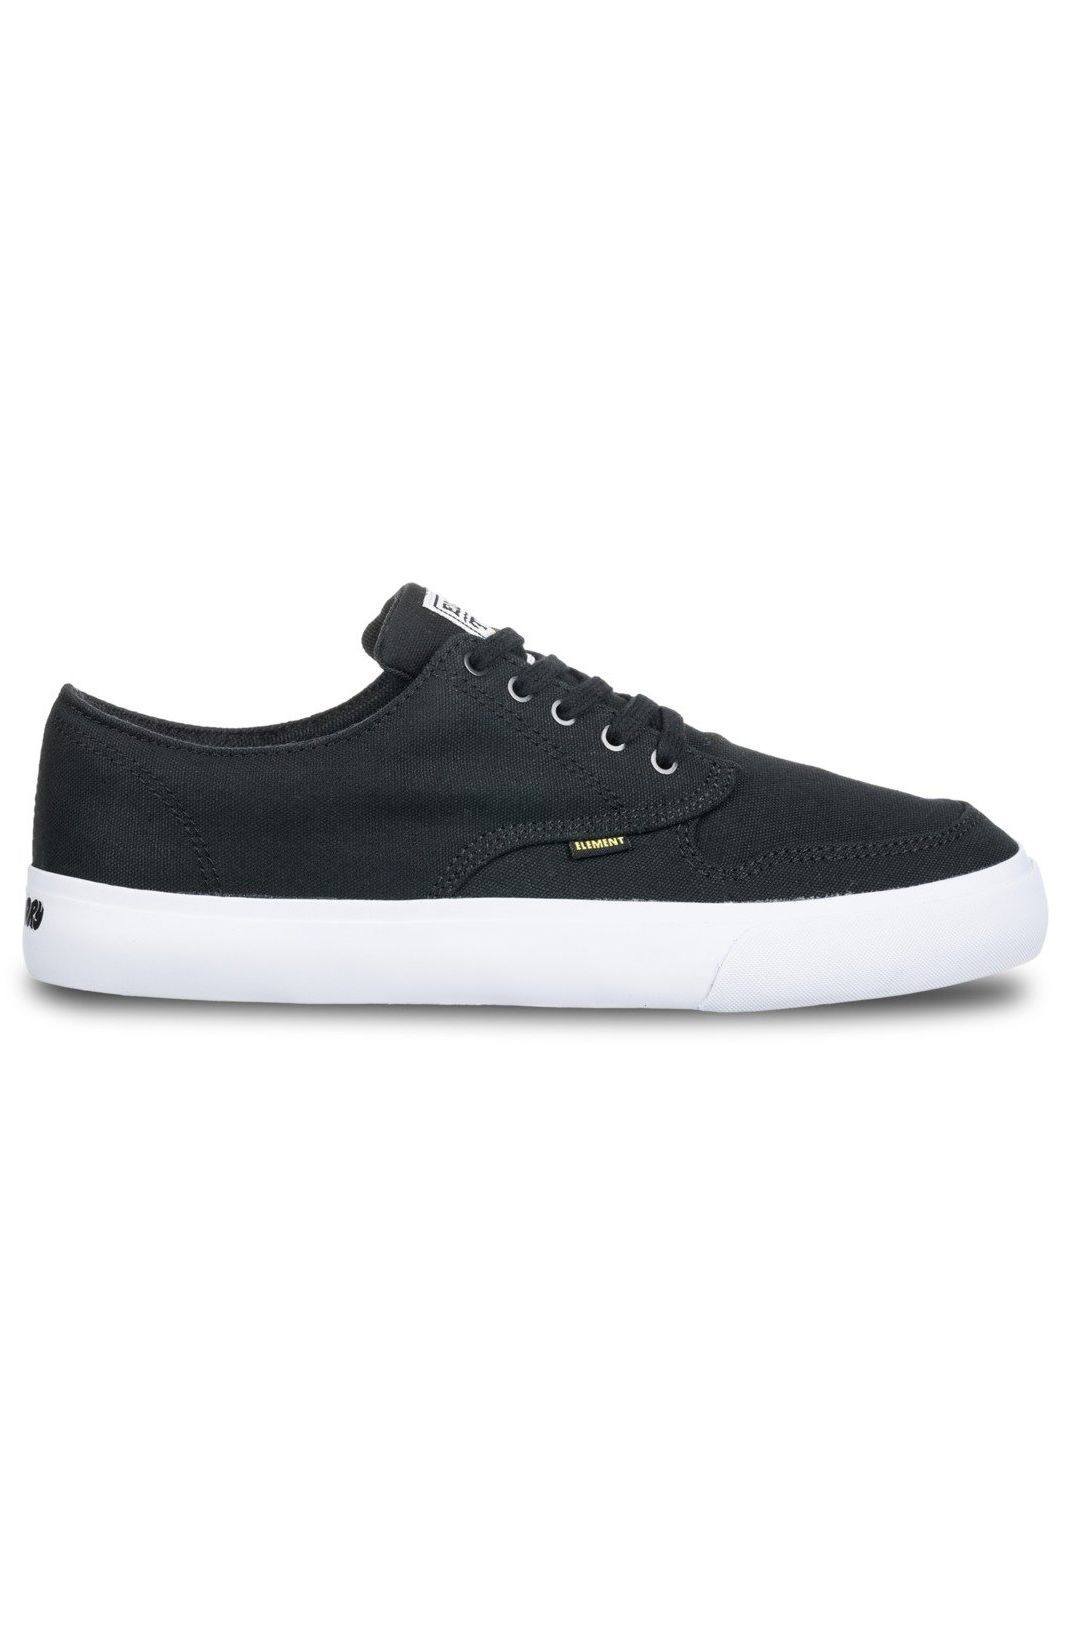 Element Shoes TOPAZ C3 Black White